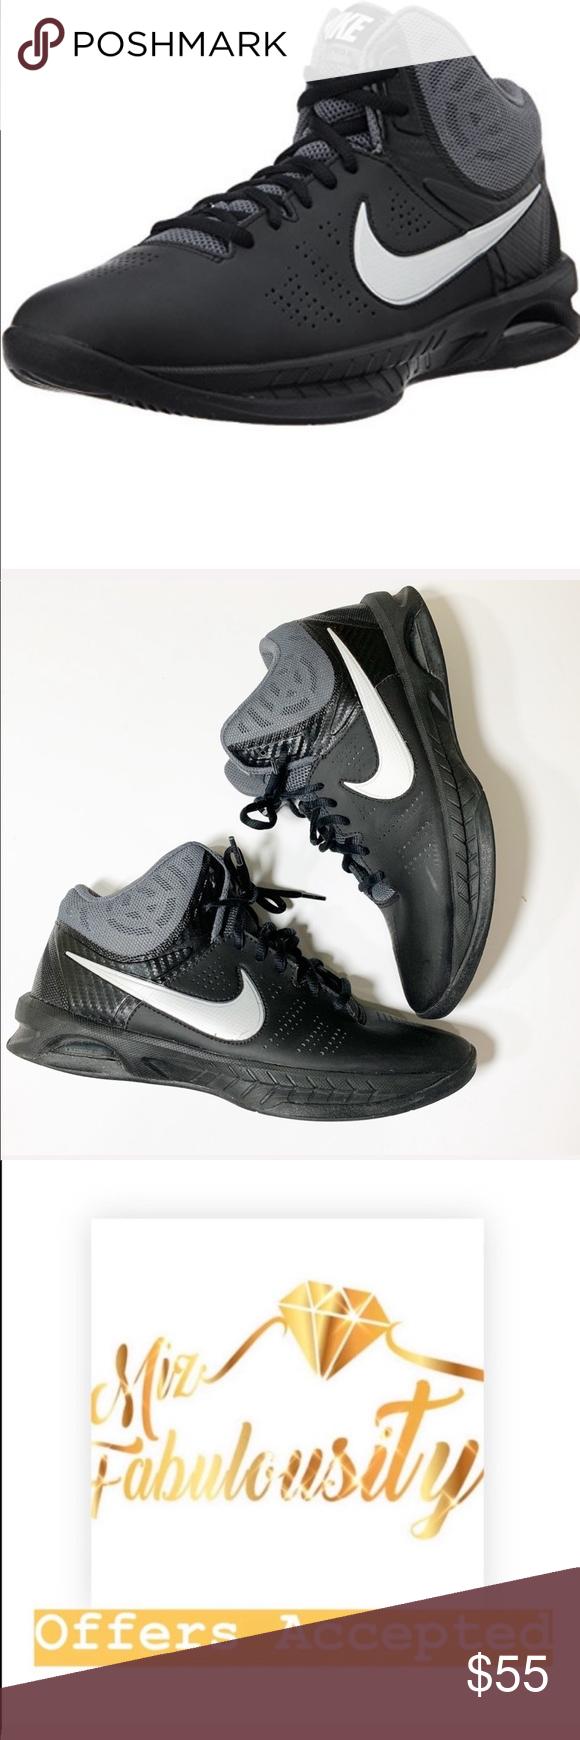 Máquina de recepción Brillar Periódico  Nike Air Visi Pro6 grey & black basketball sneaker Nike Air Visi Pro 6 grey  & black basket ball sneaker ******Size Men's 7.5 is Nike … | Nike air, Nike,  Sneakers